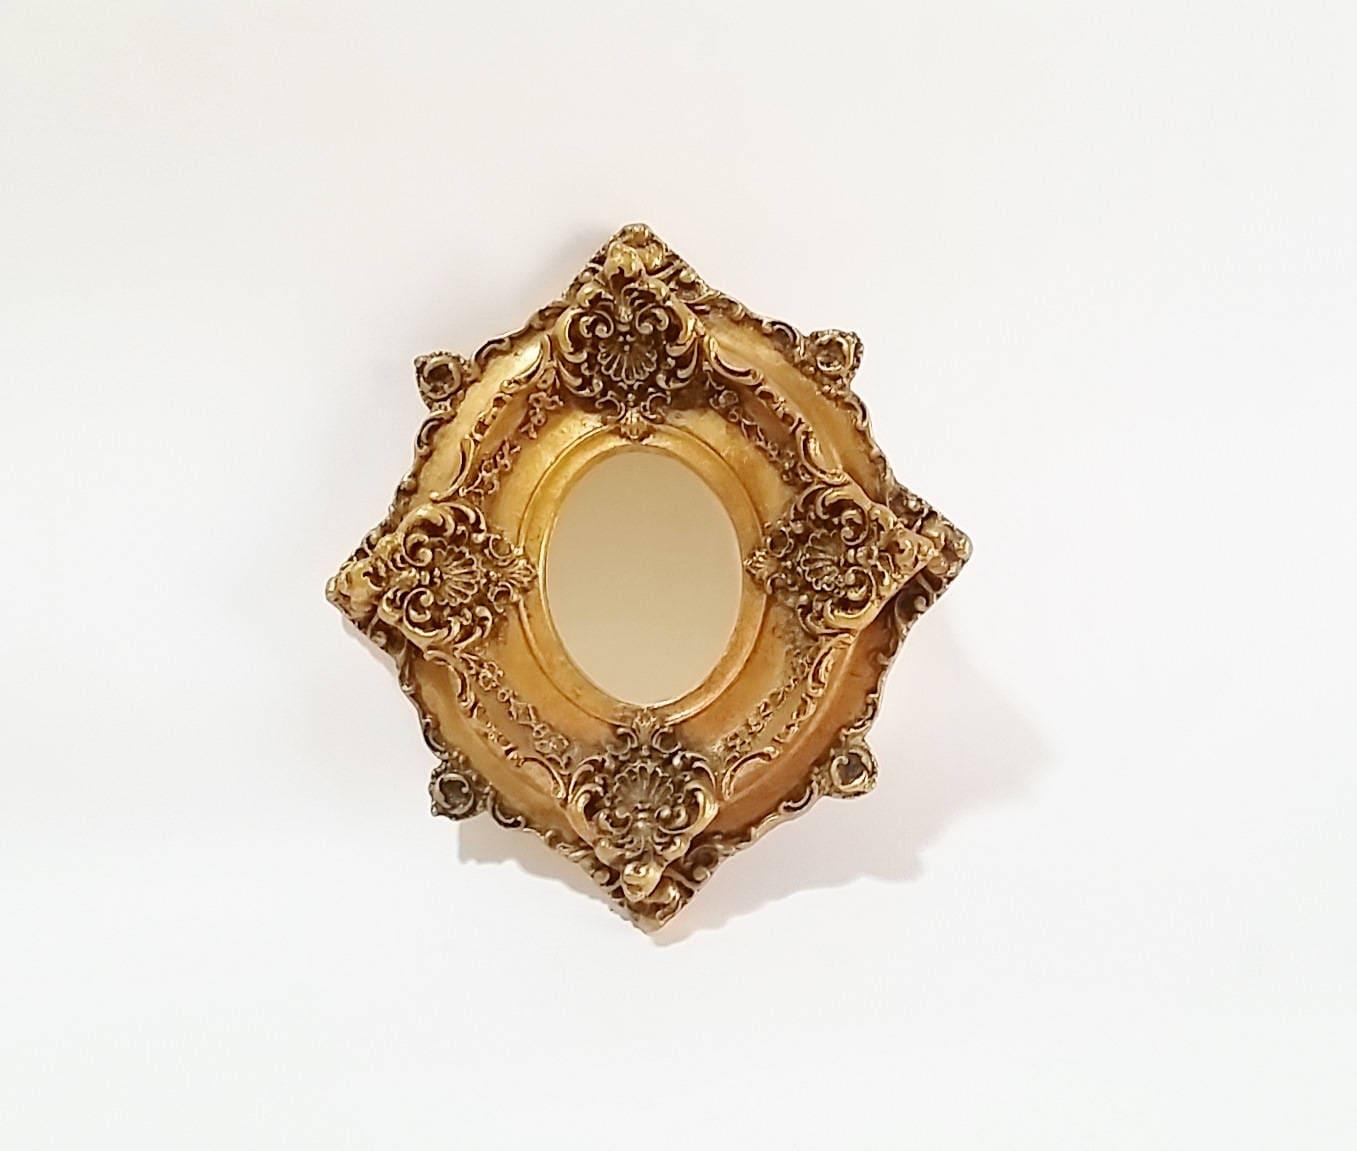 Decorative Gold Mirrors. Vintage Gold Mirrors  Round Mirror Small Wall Decorative